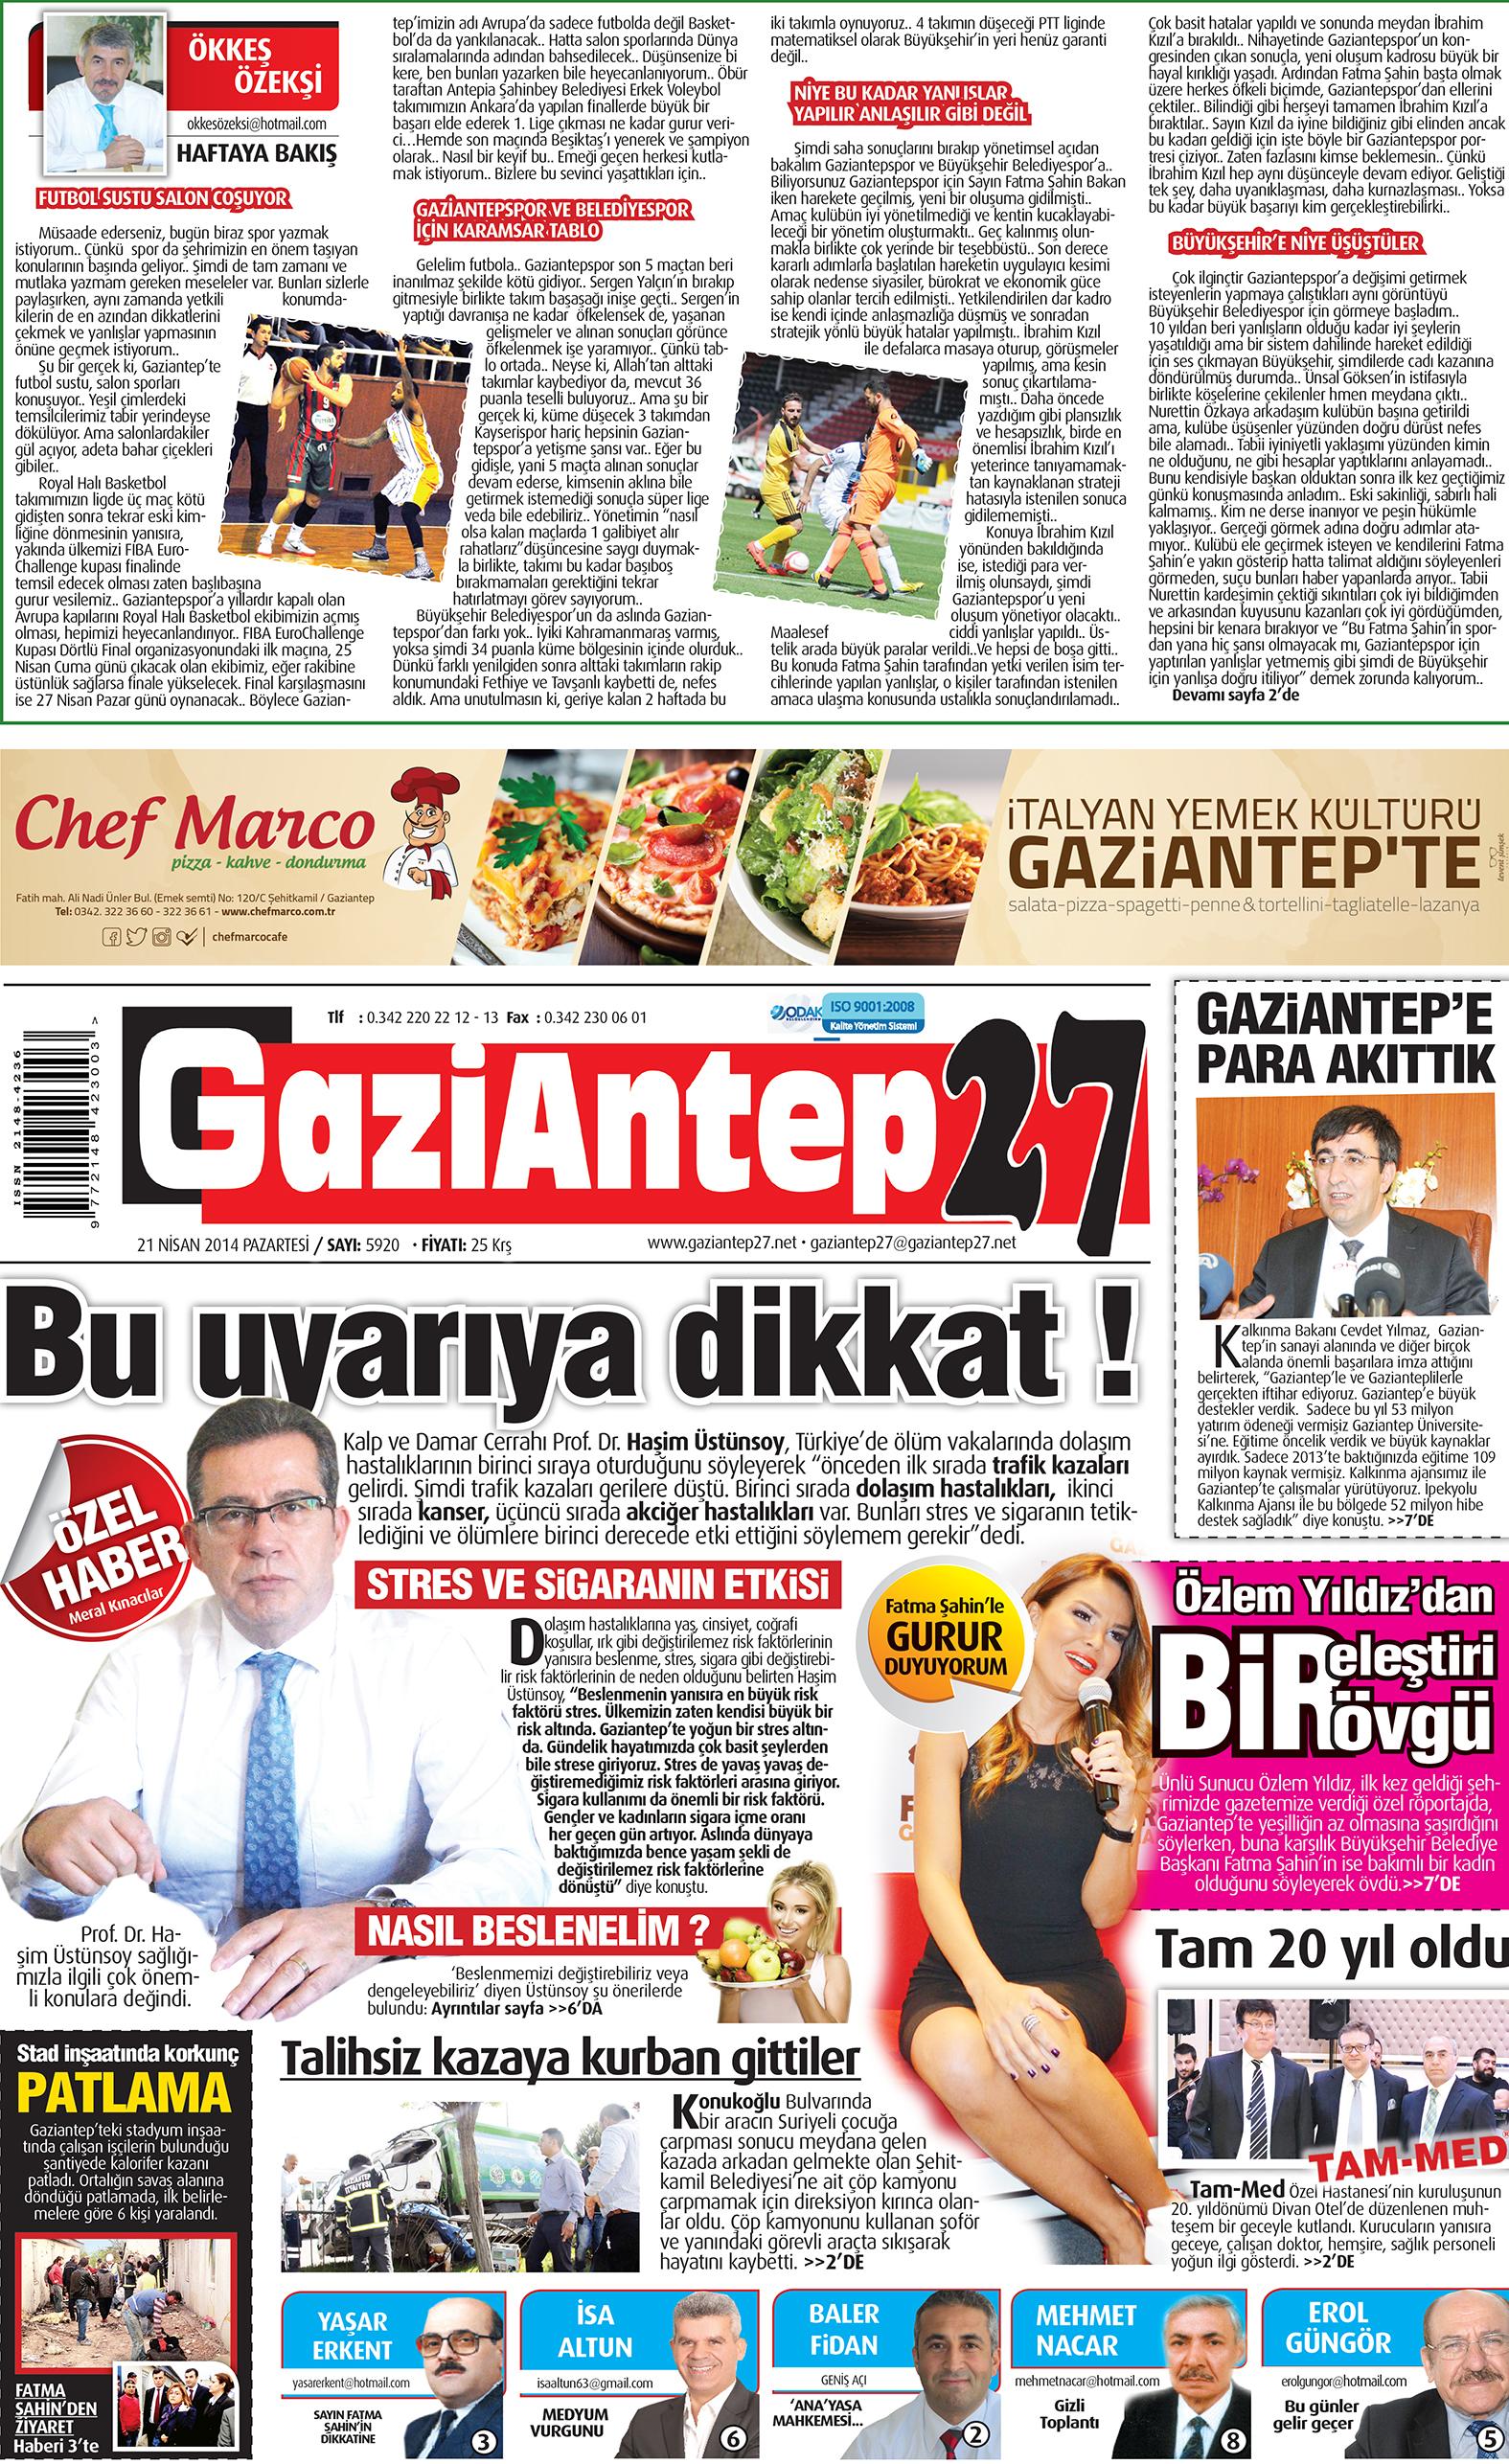 21 Nisan 2014 sayfalar 1